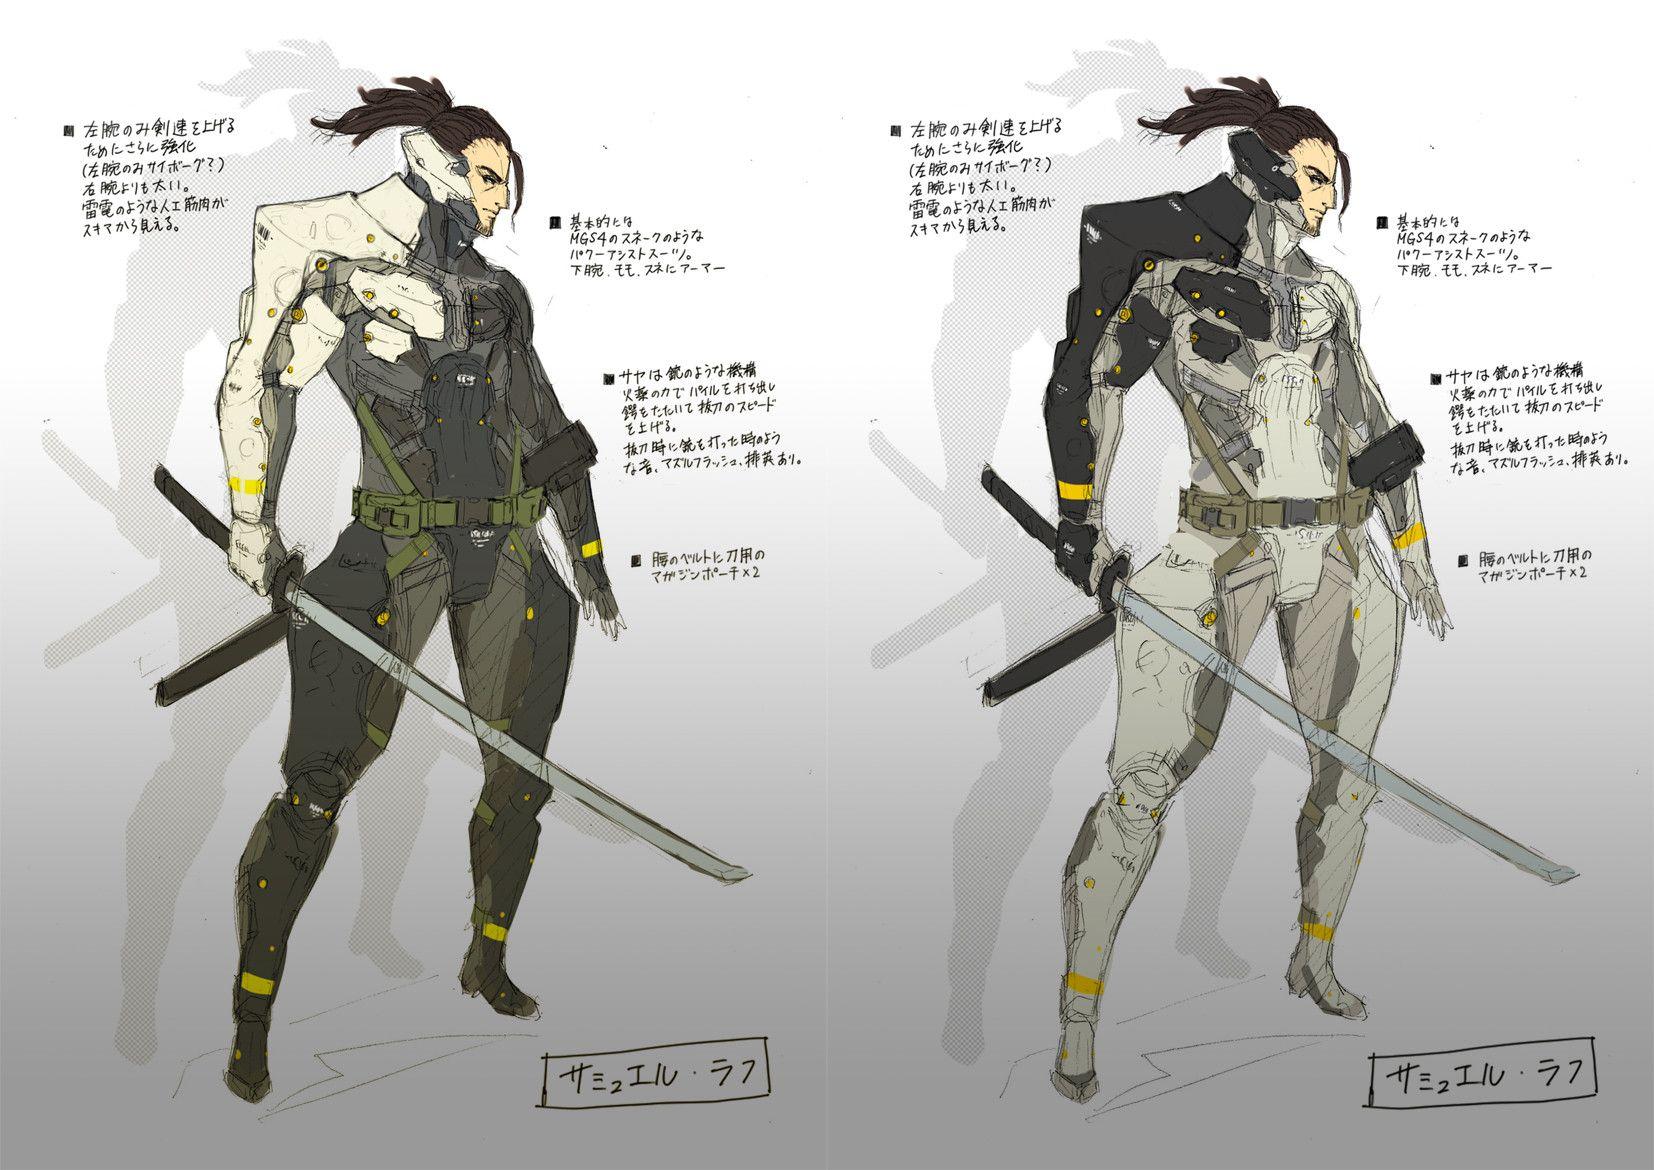 Metal gear rising revengeance samuel concept art for Metal concept